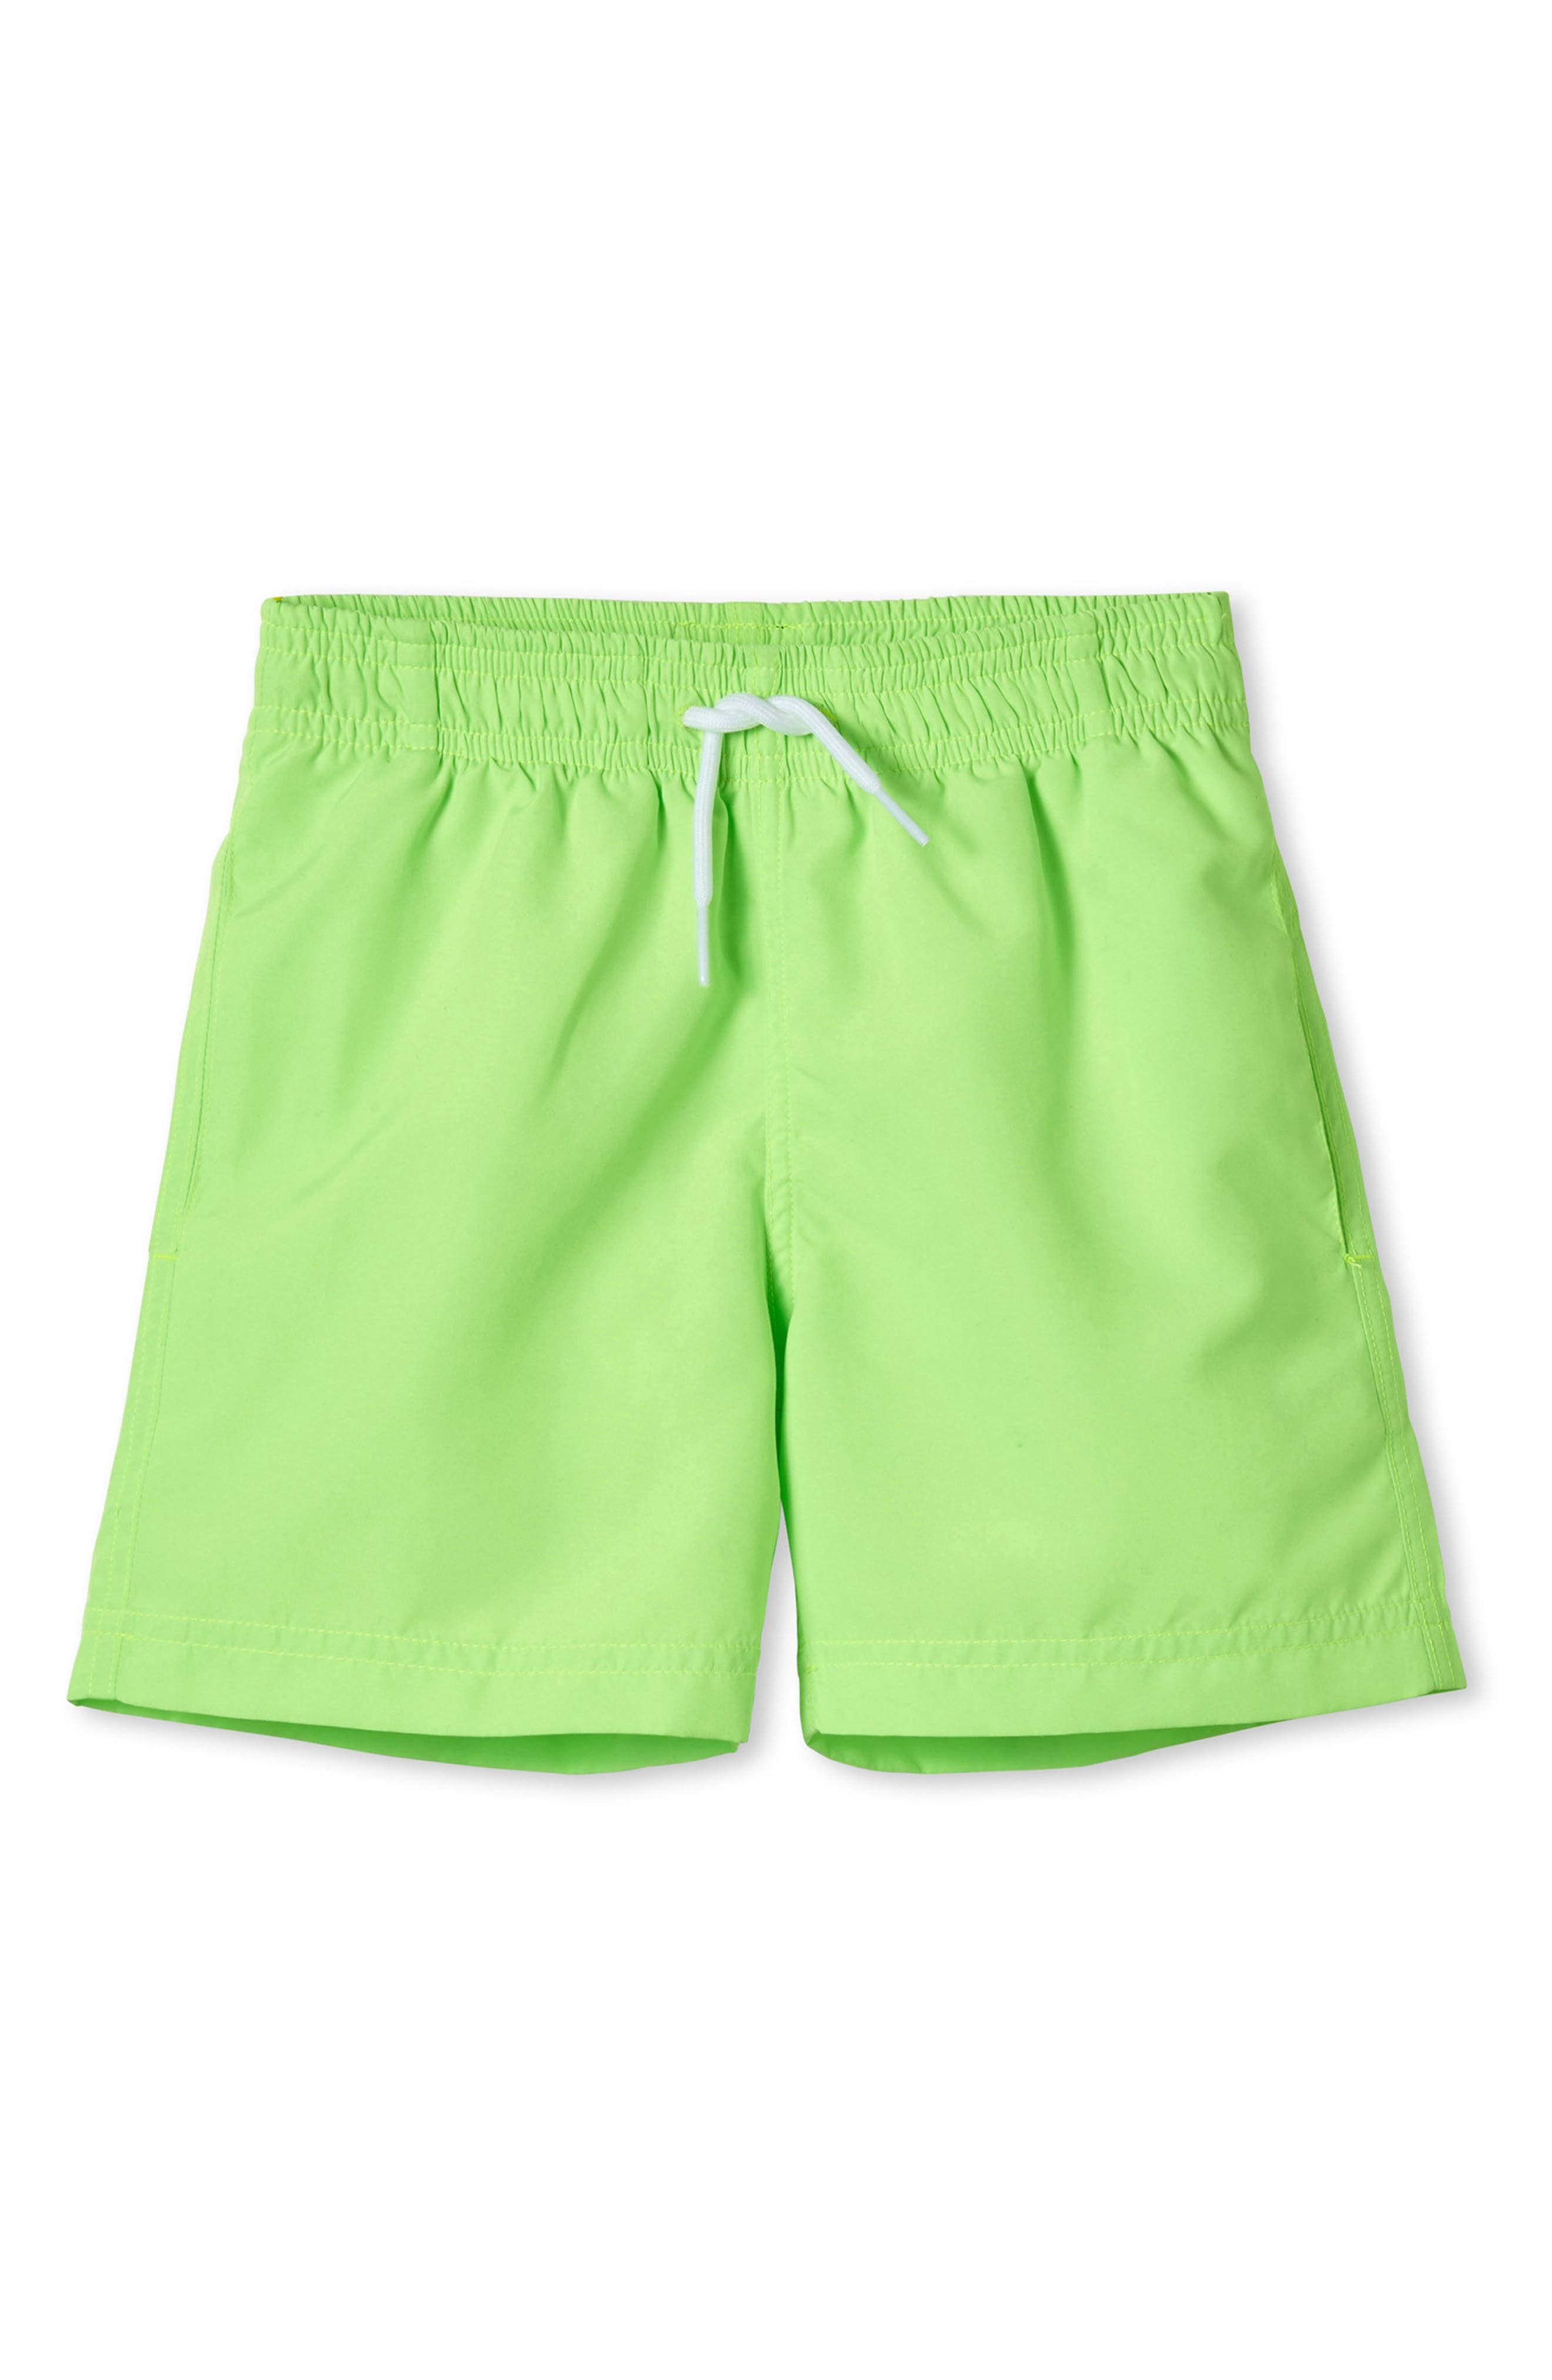 Neon Green Swim Trunks,                         Main,                         color, Neon Green